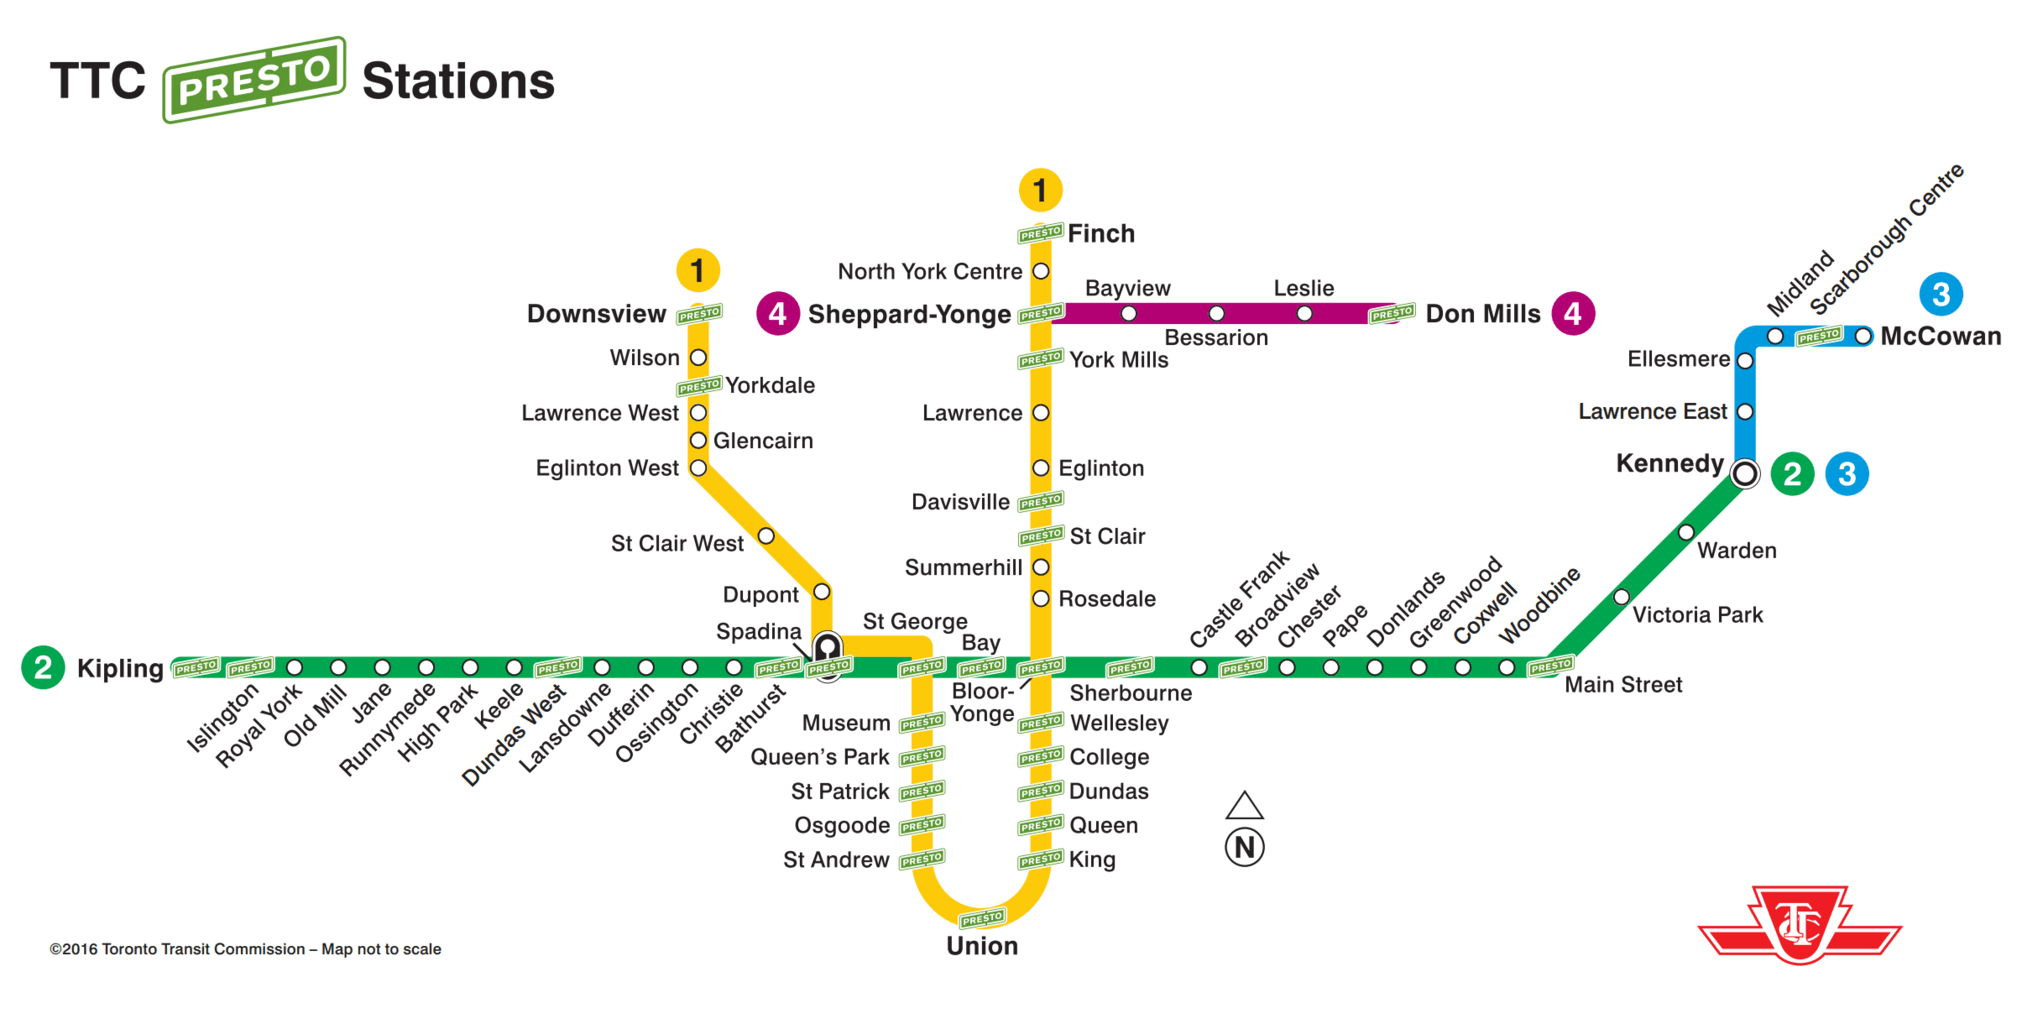 how to get around toronto with subway  streetcars  for two please - toronto ttc subway presto stations  get around toronto